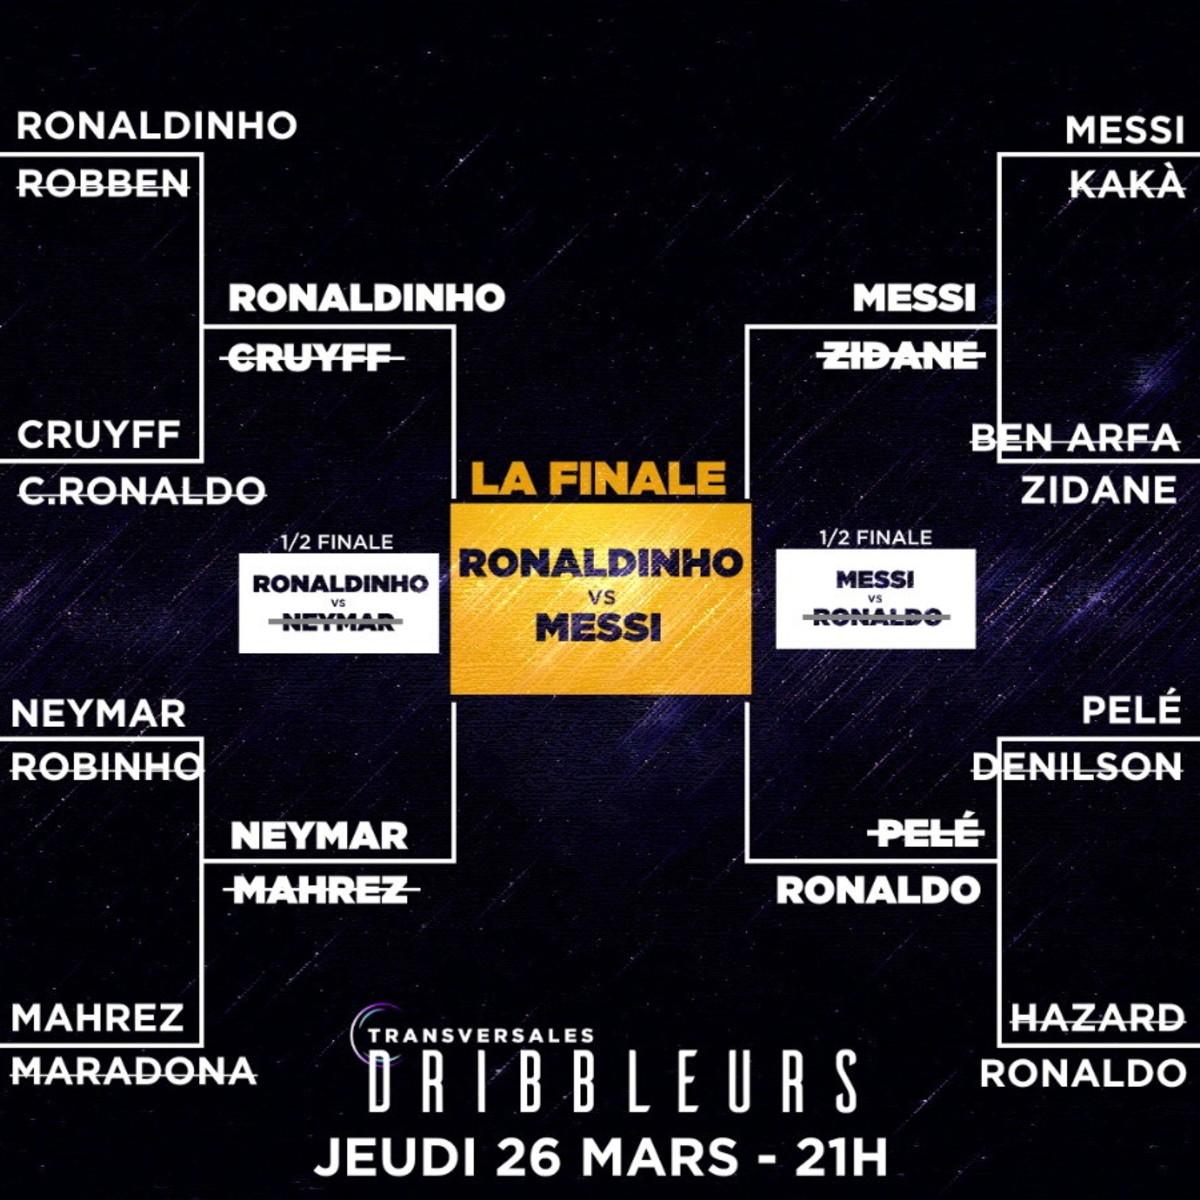 Per i francesi Messi è il migliore di sempre nei dribbling